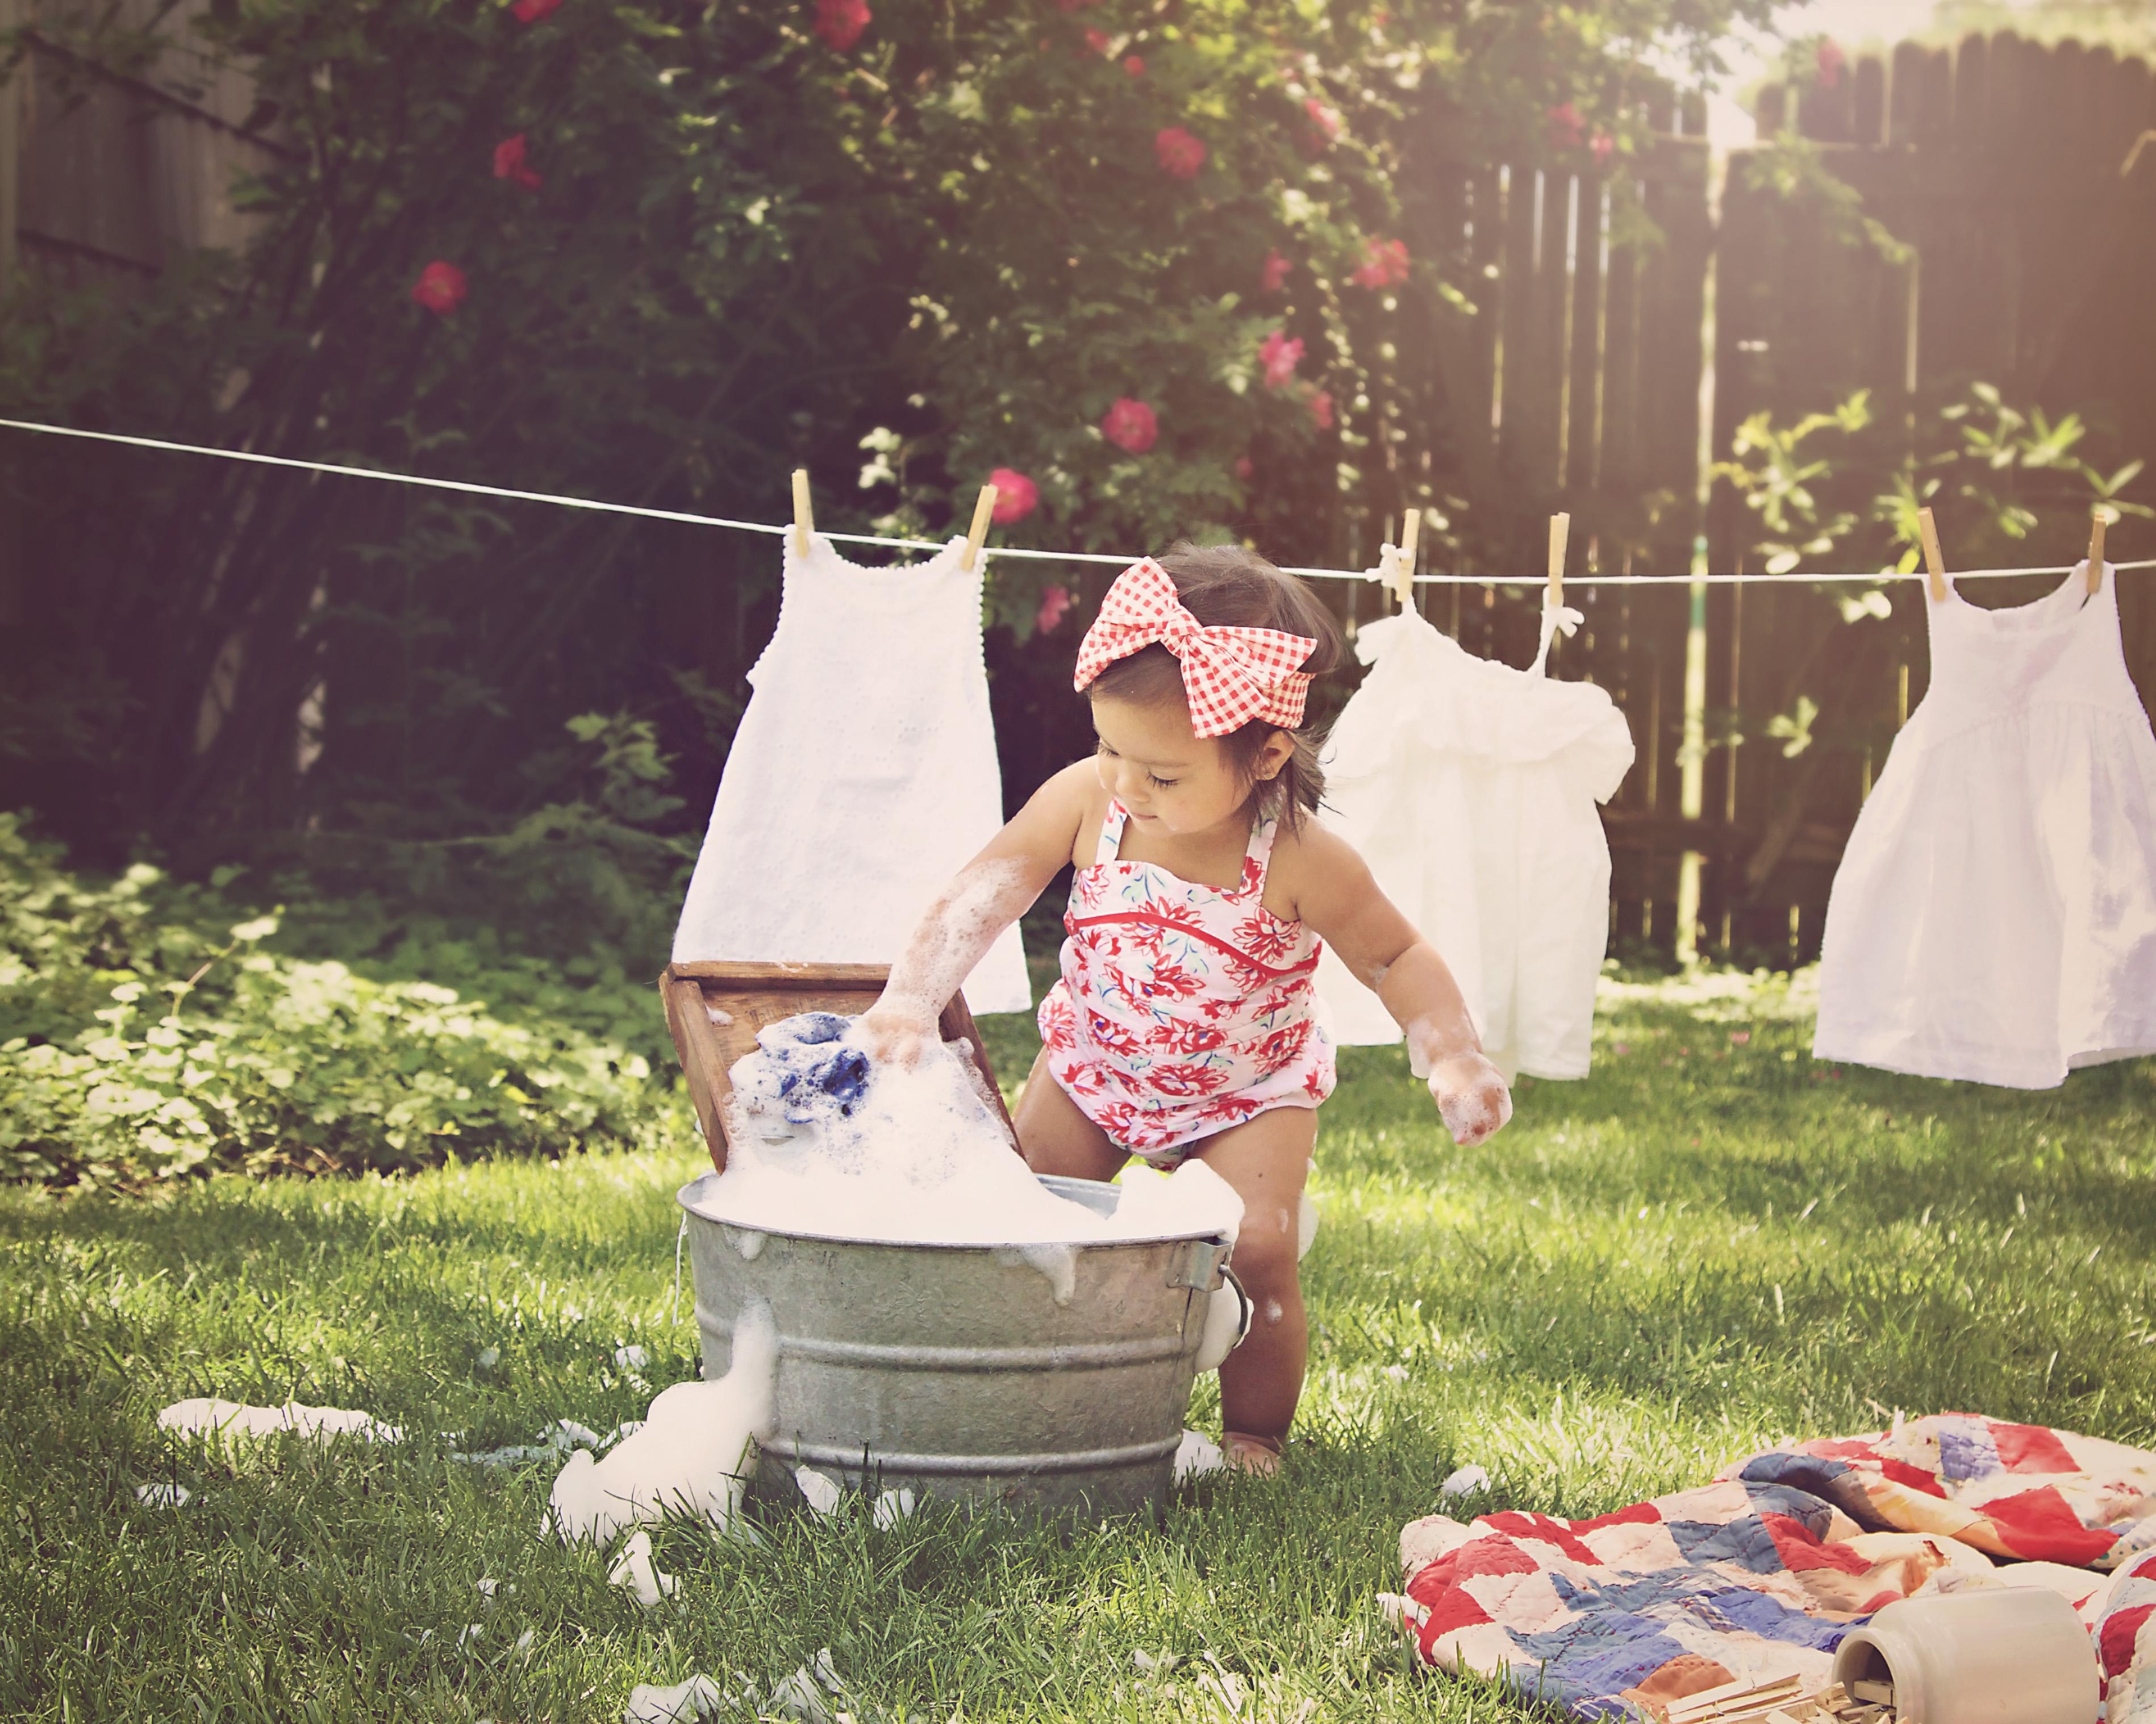 Laundry 1-1